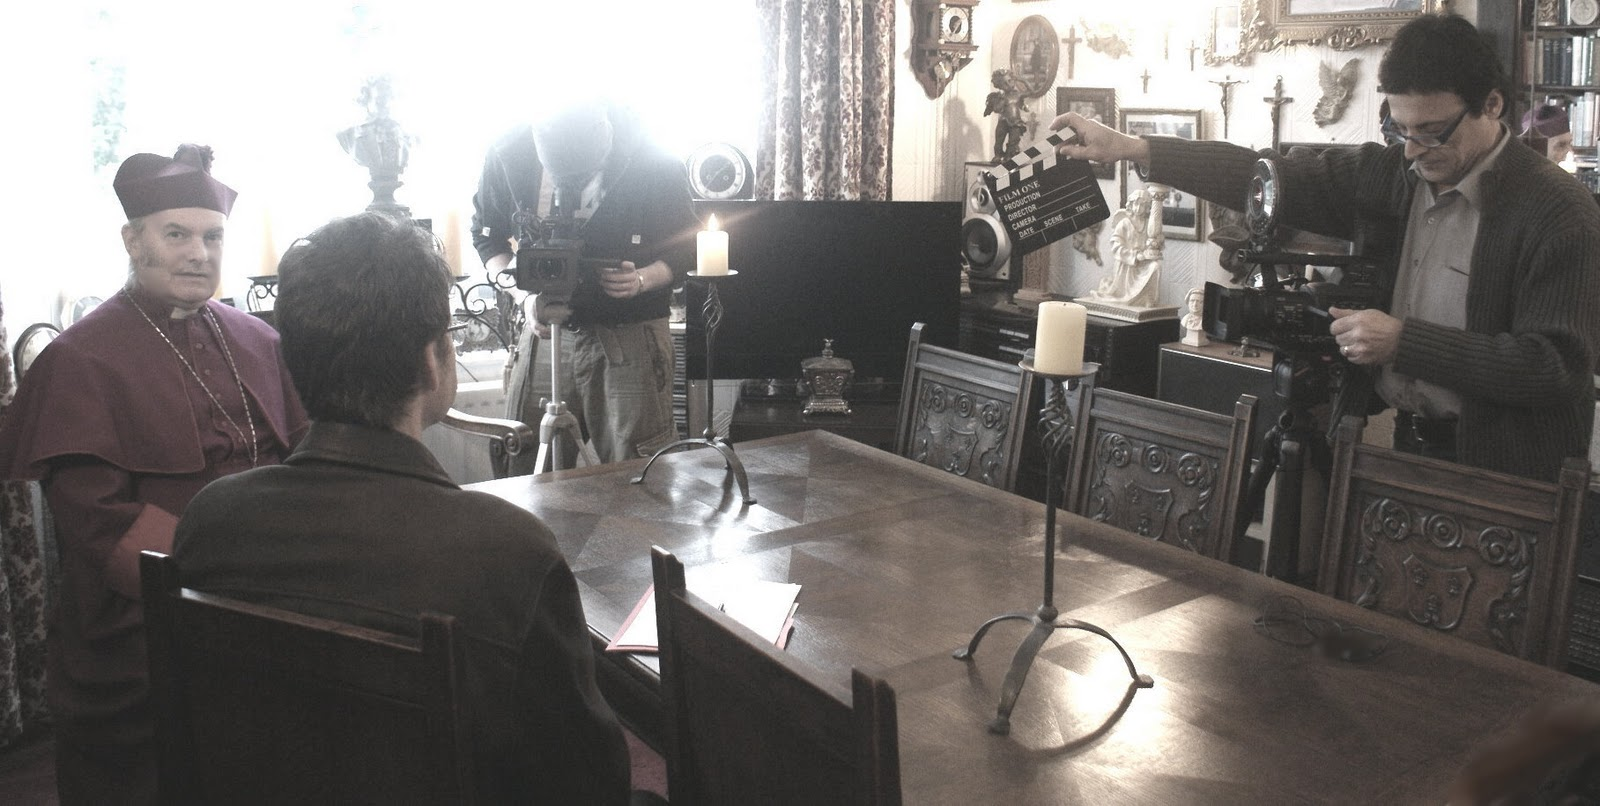 Vampire Hunters Being Interviewed